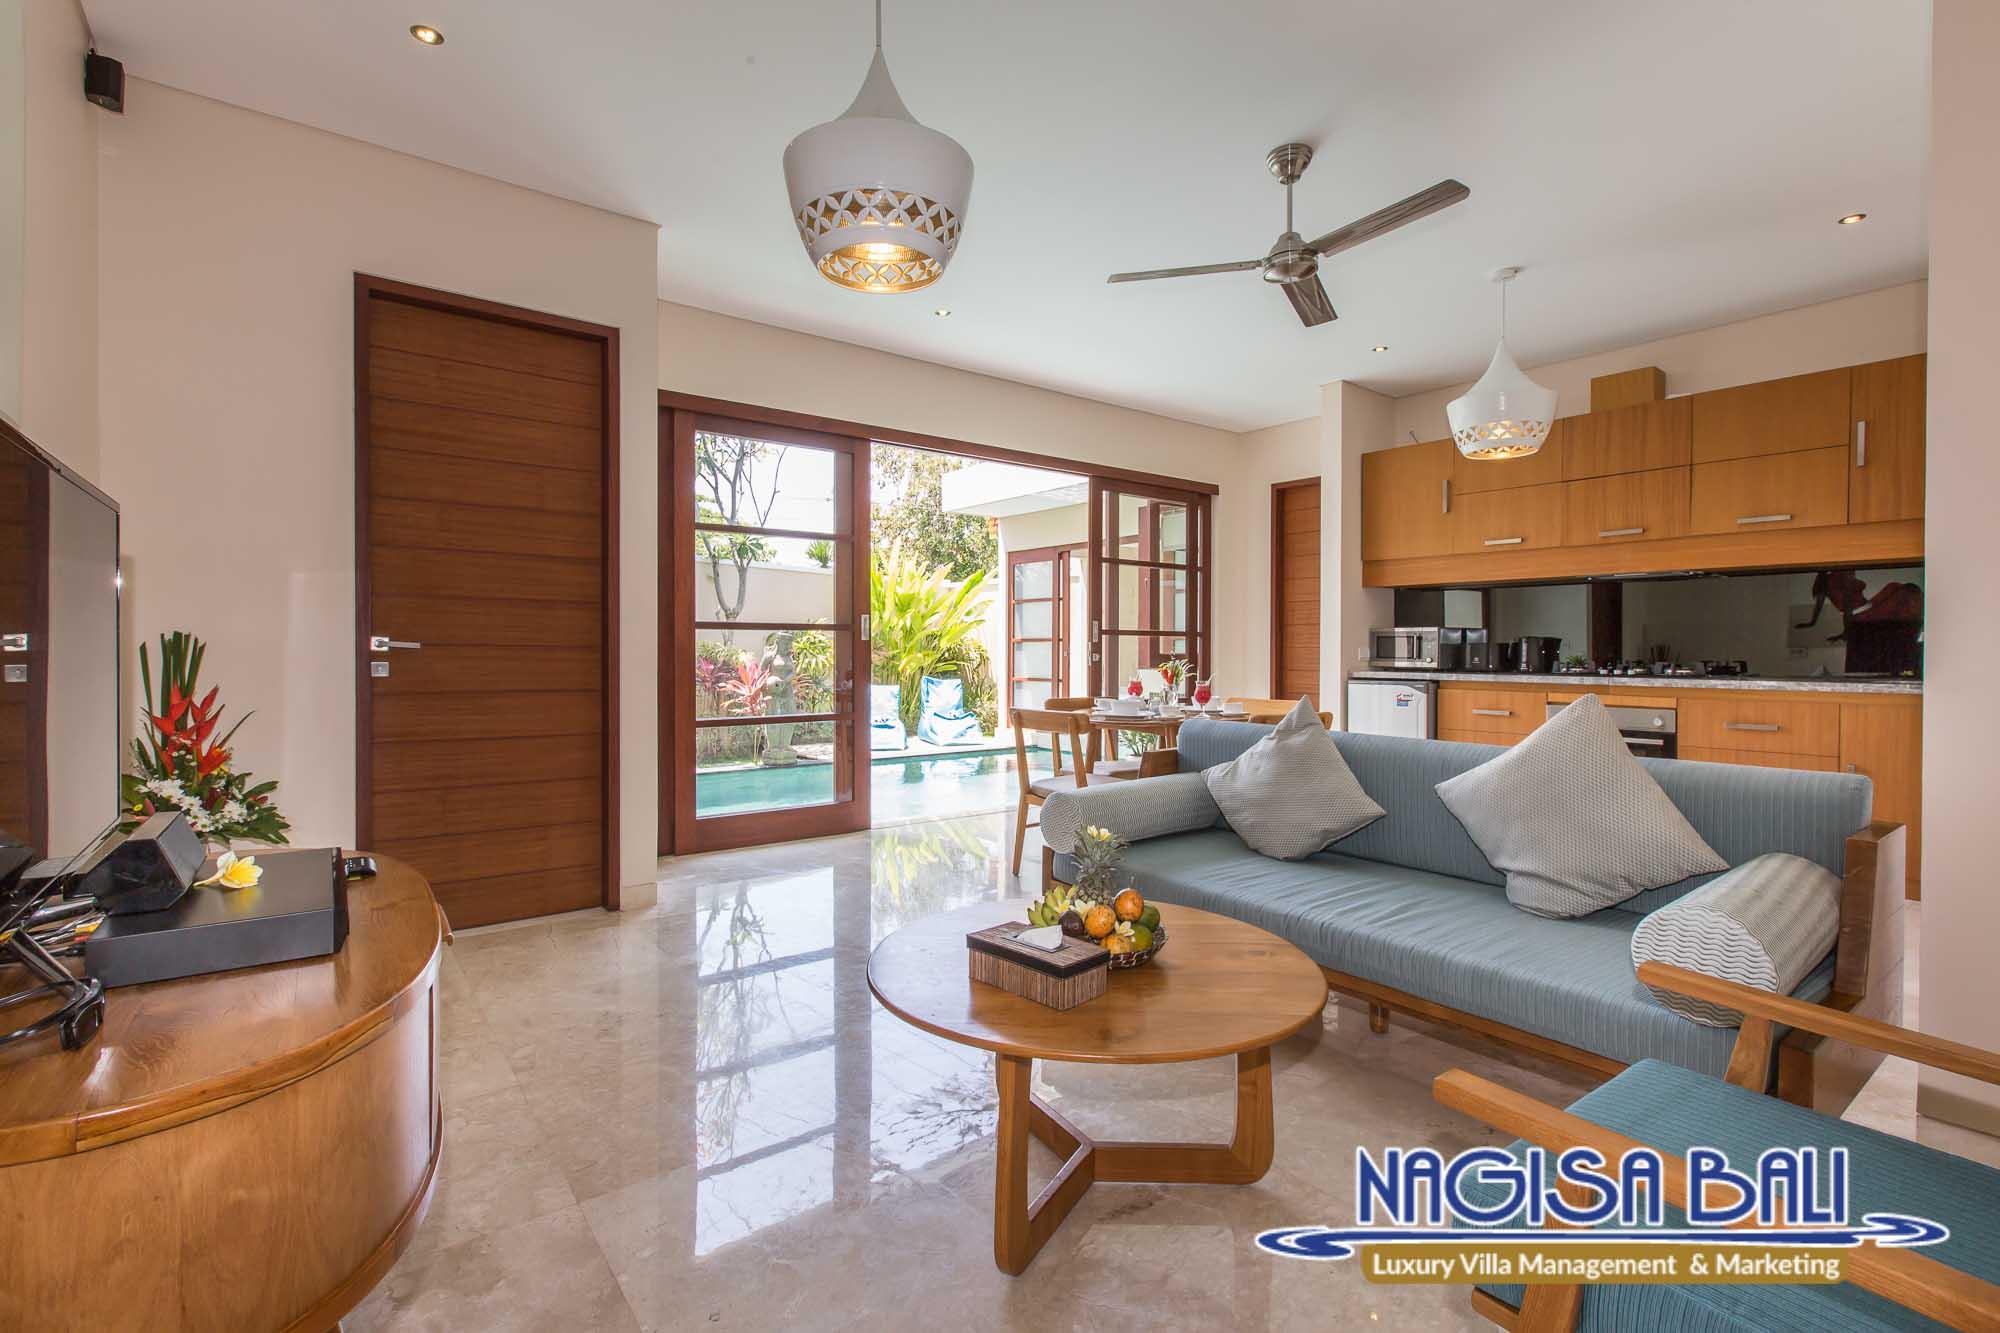 BBVillas 1 Bed-Lounge Area-0922-Managed-by-Nagisa-Bali-70